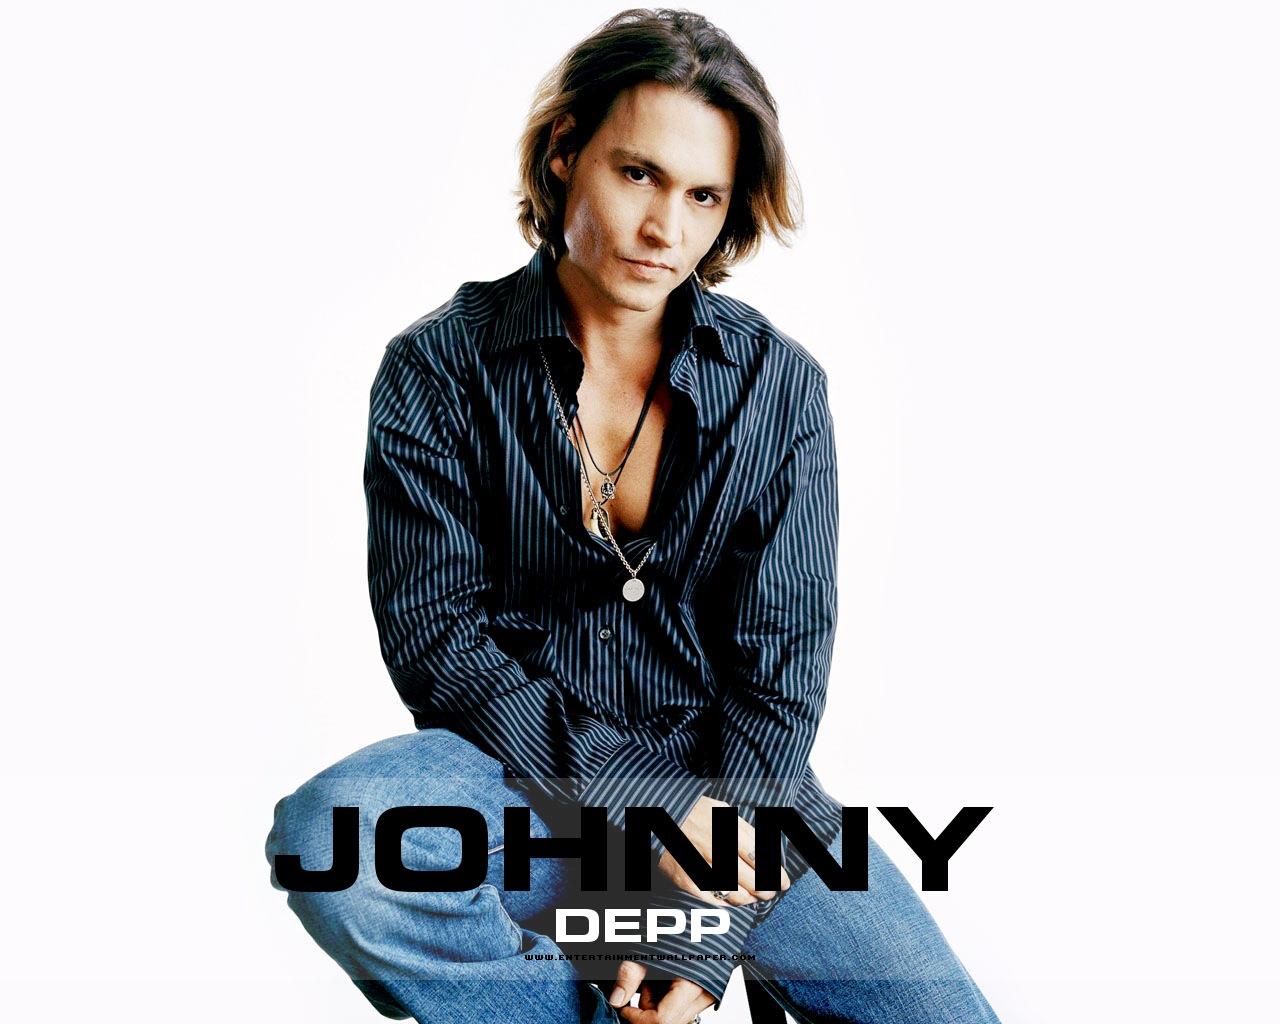 http://2.bp.blogspot.com/_Yj8bd0dvA5M/S8HQrFEWGyI/AAAAAAAAANI/OFANUokdDw0/s1600/johnny_depp08.jpg